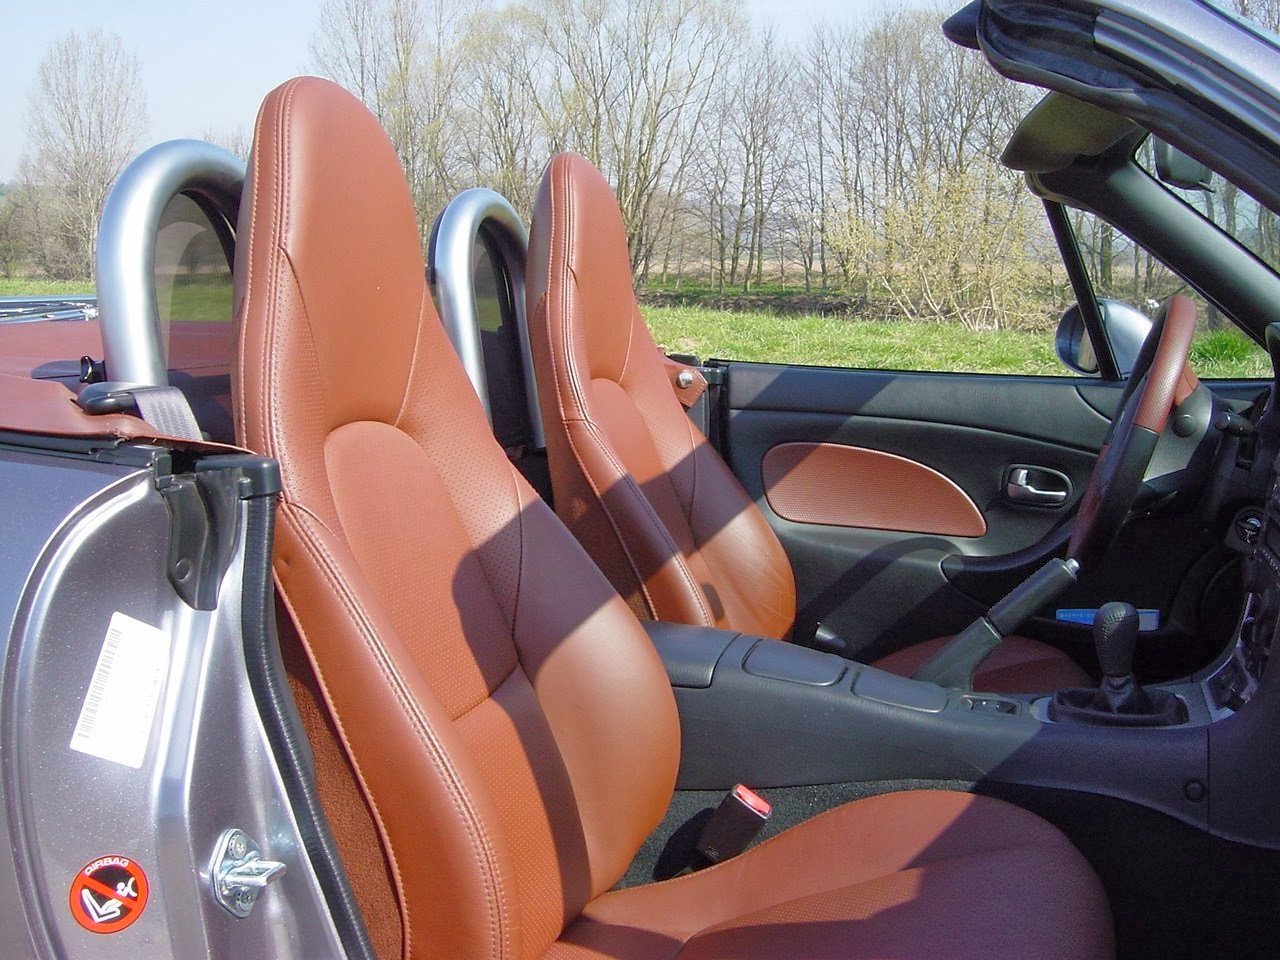 mazda in turbo phoenix cars used for sale classifieds buckinghamshire mx